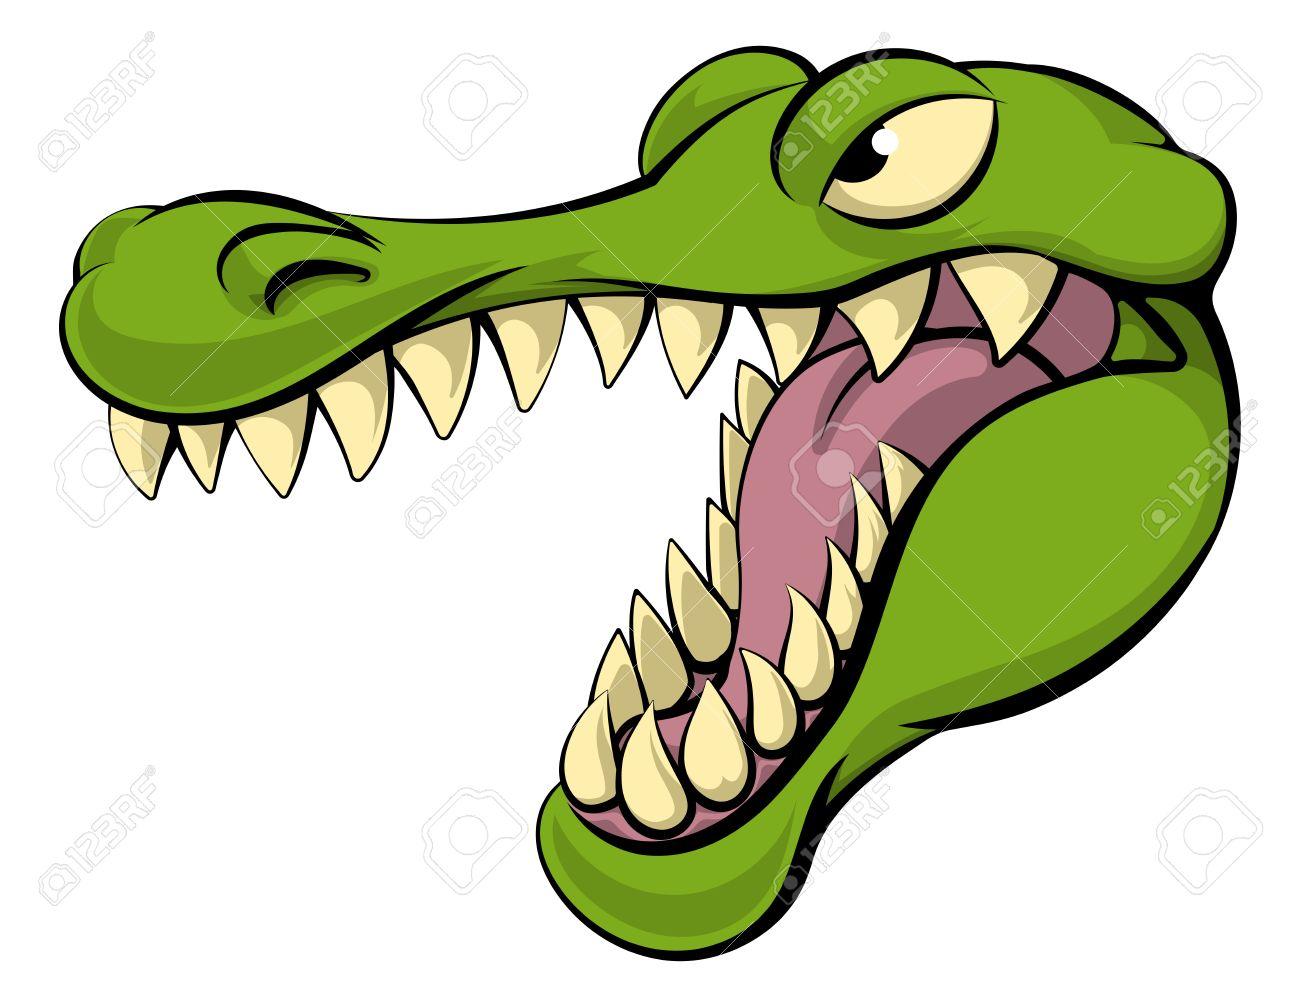 Alligator or crocodile cartoon character sports mascot head.